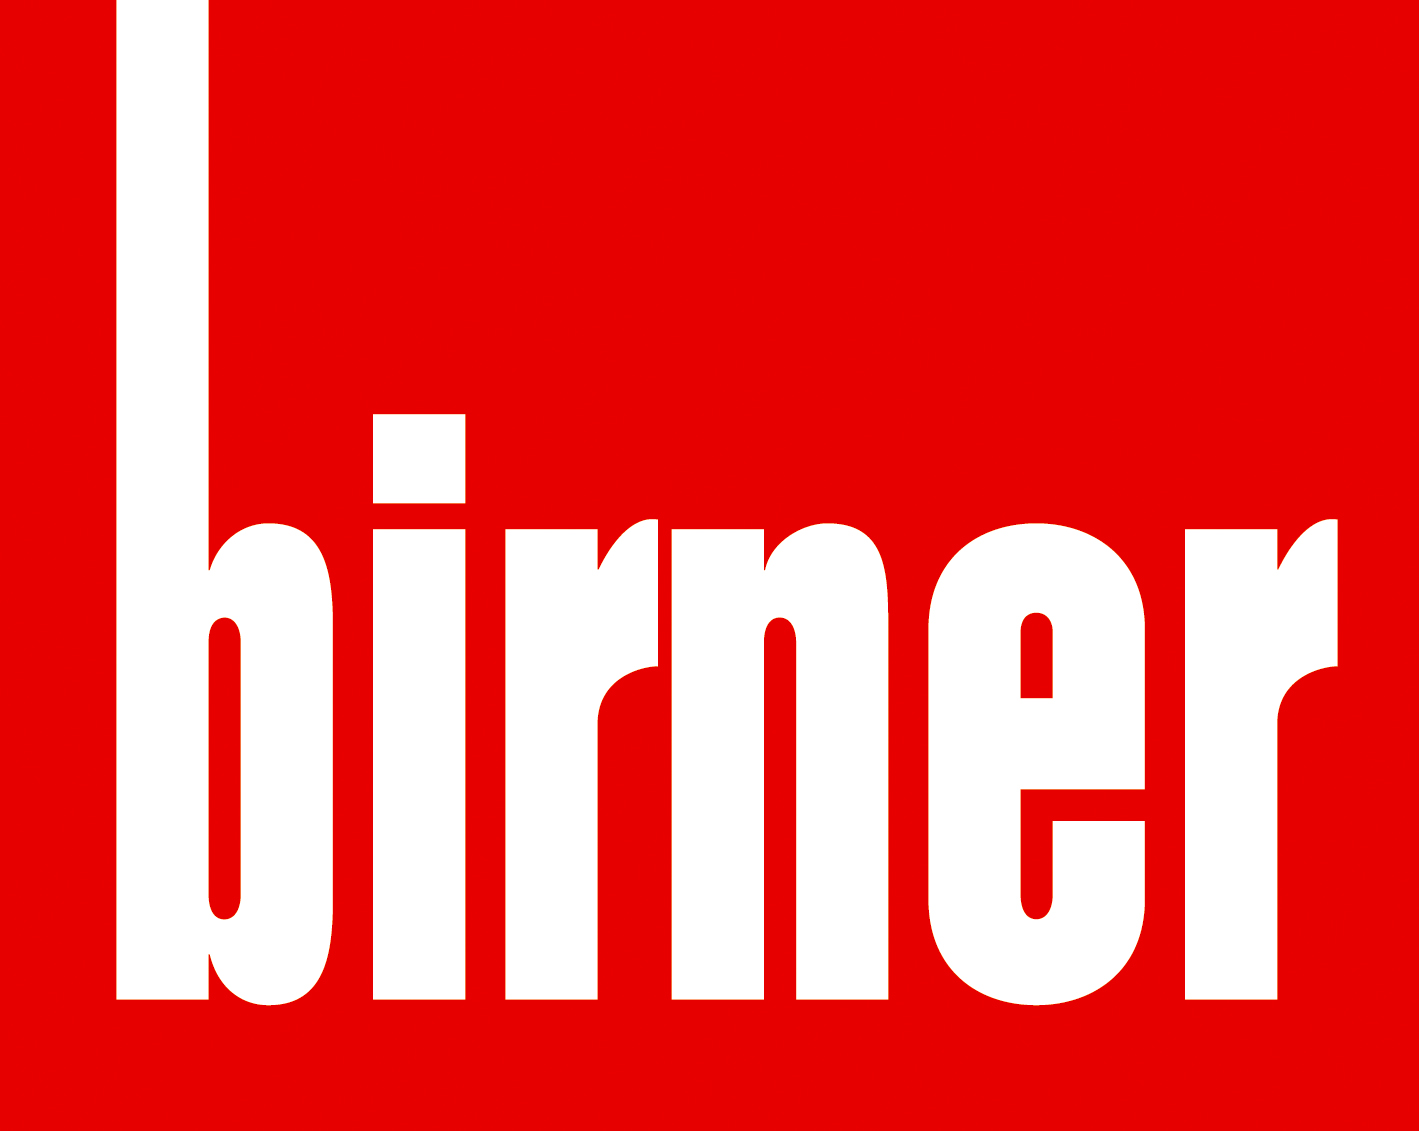 Birner Klagenfurt